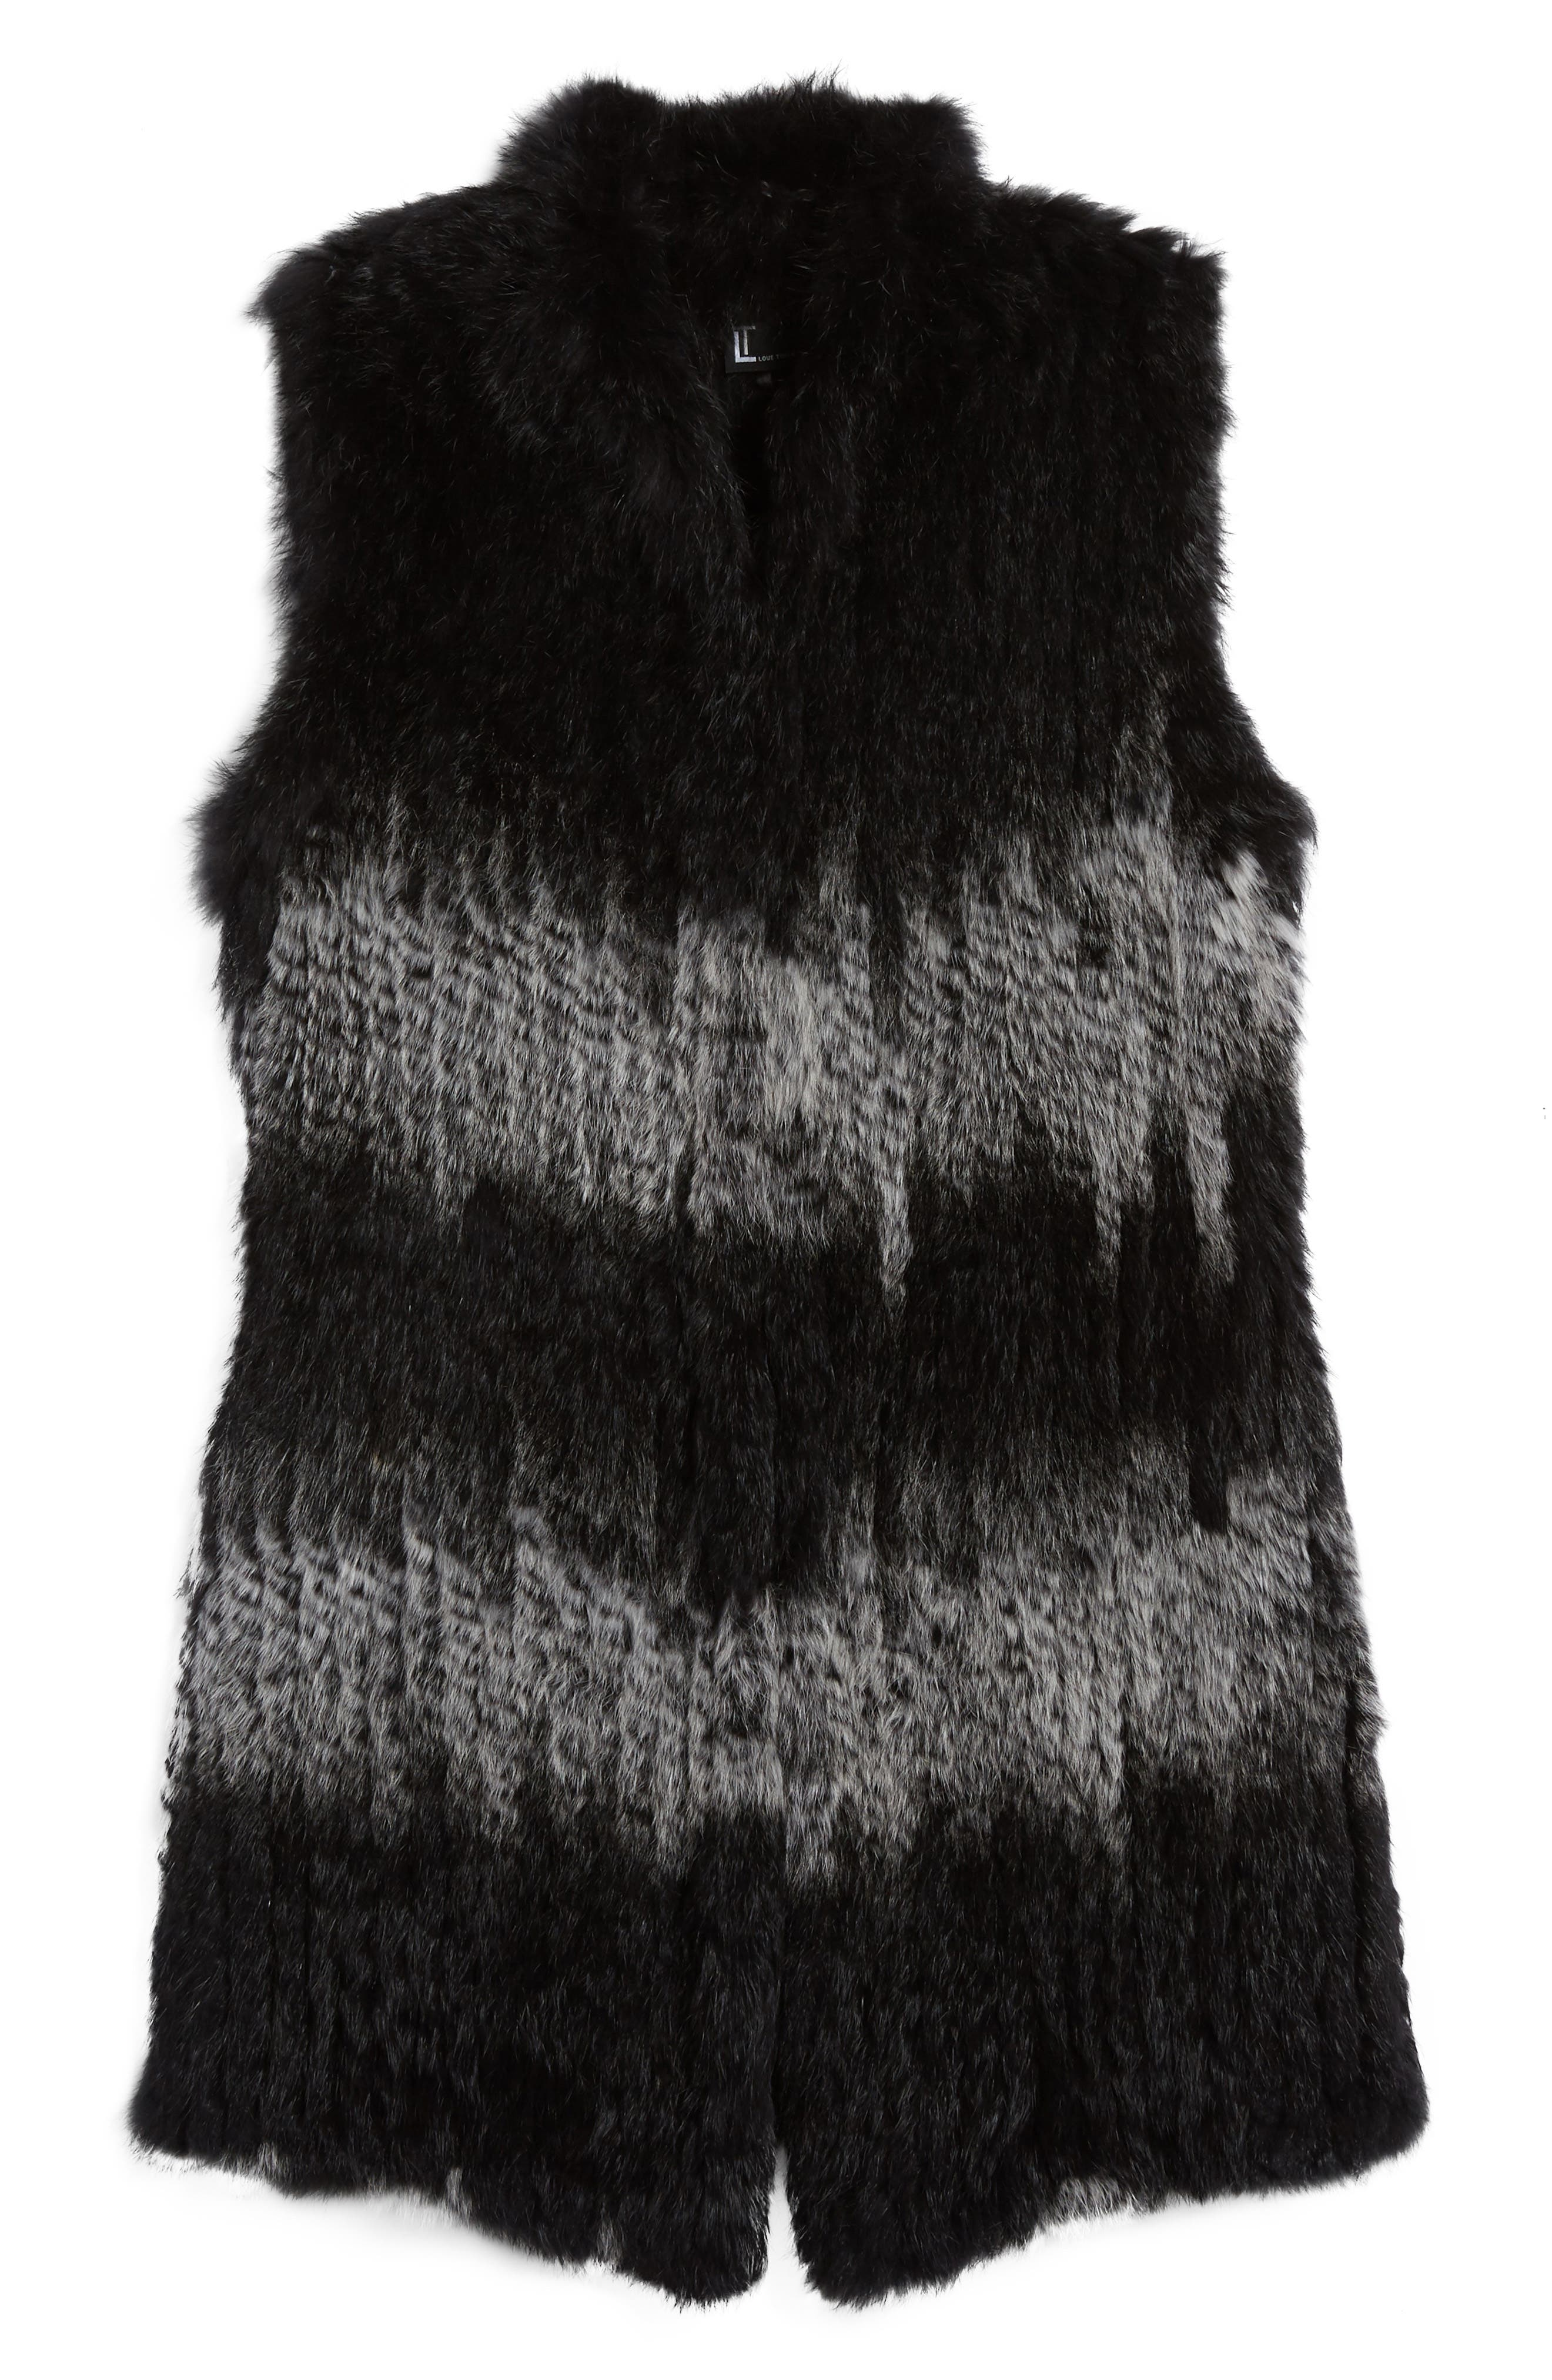 Stripe Genuine Rabbit Fur Vest,                             Alternate thumbnail 5, color,                             962